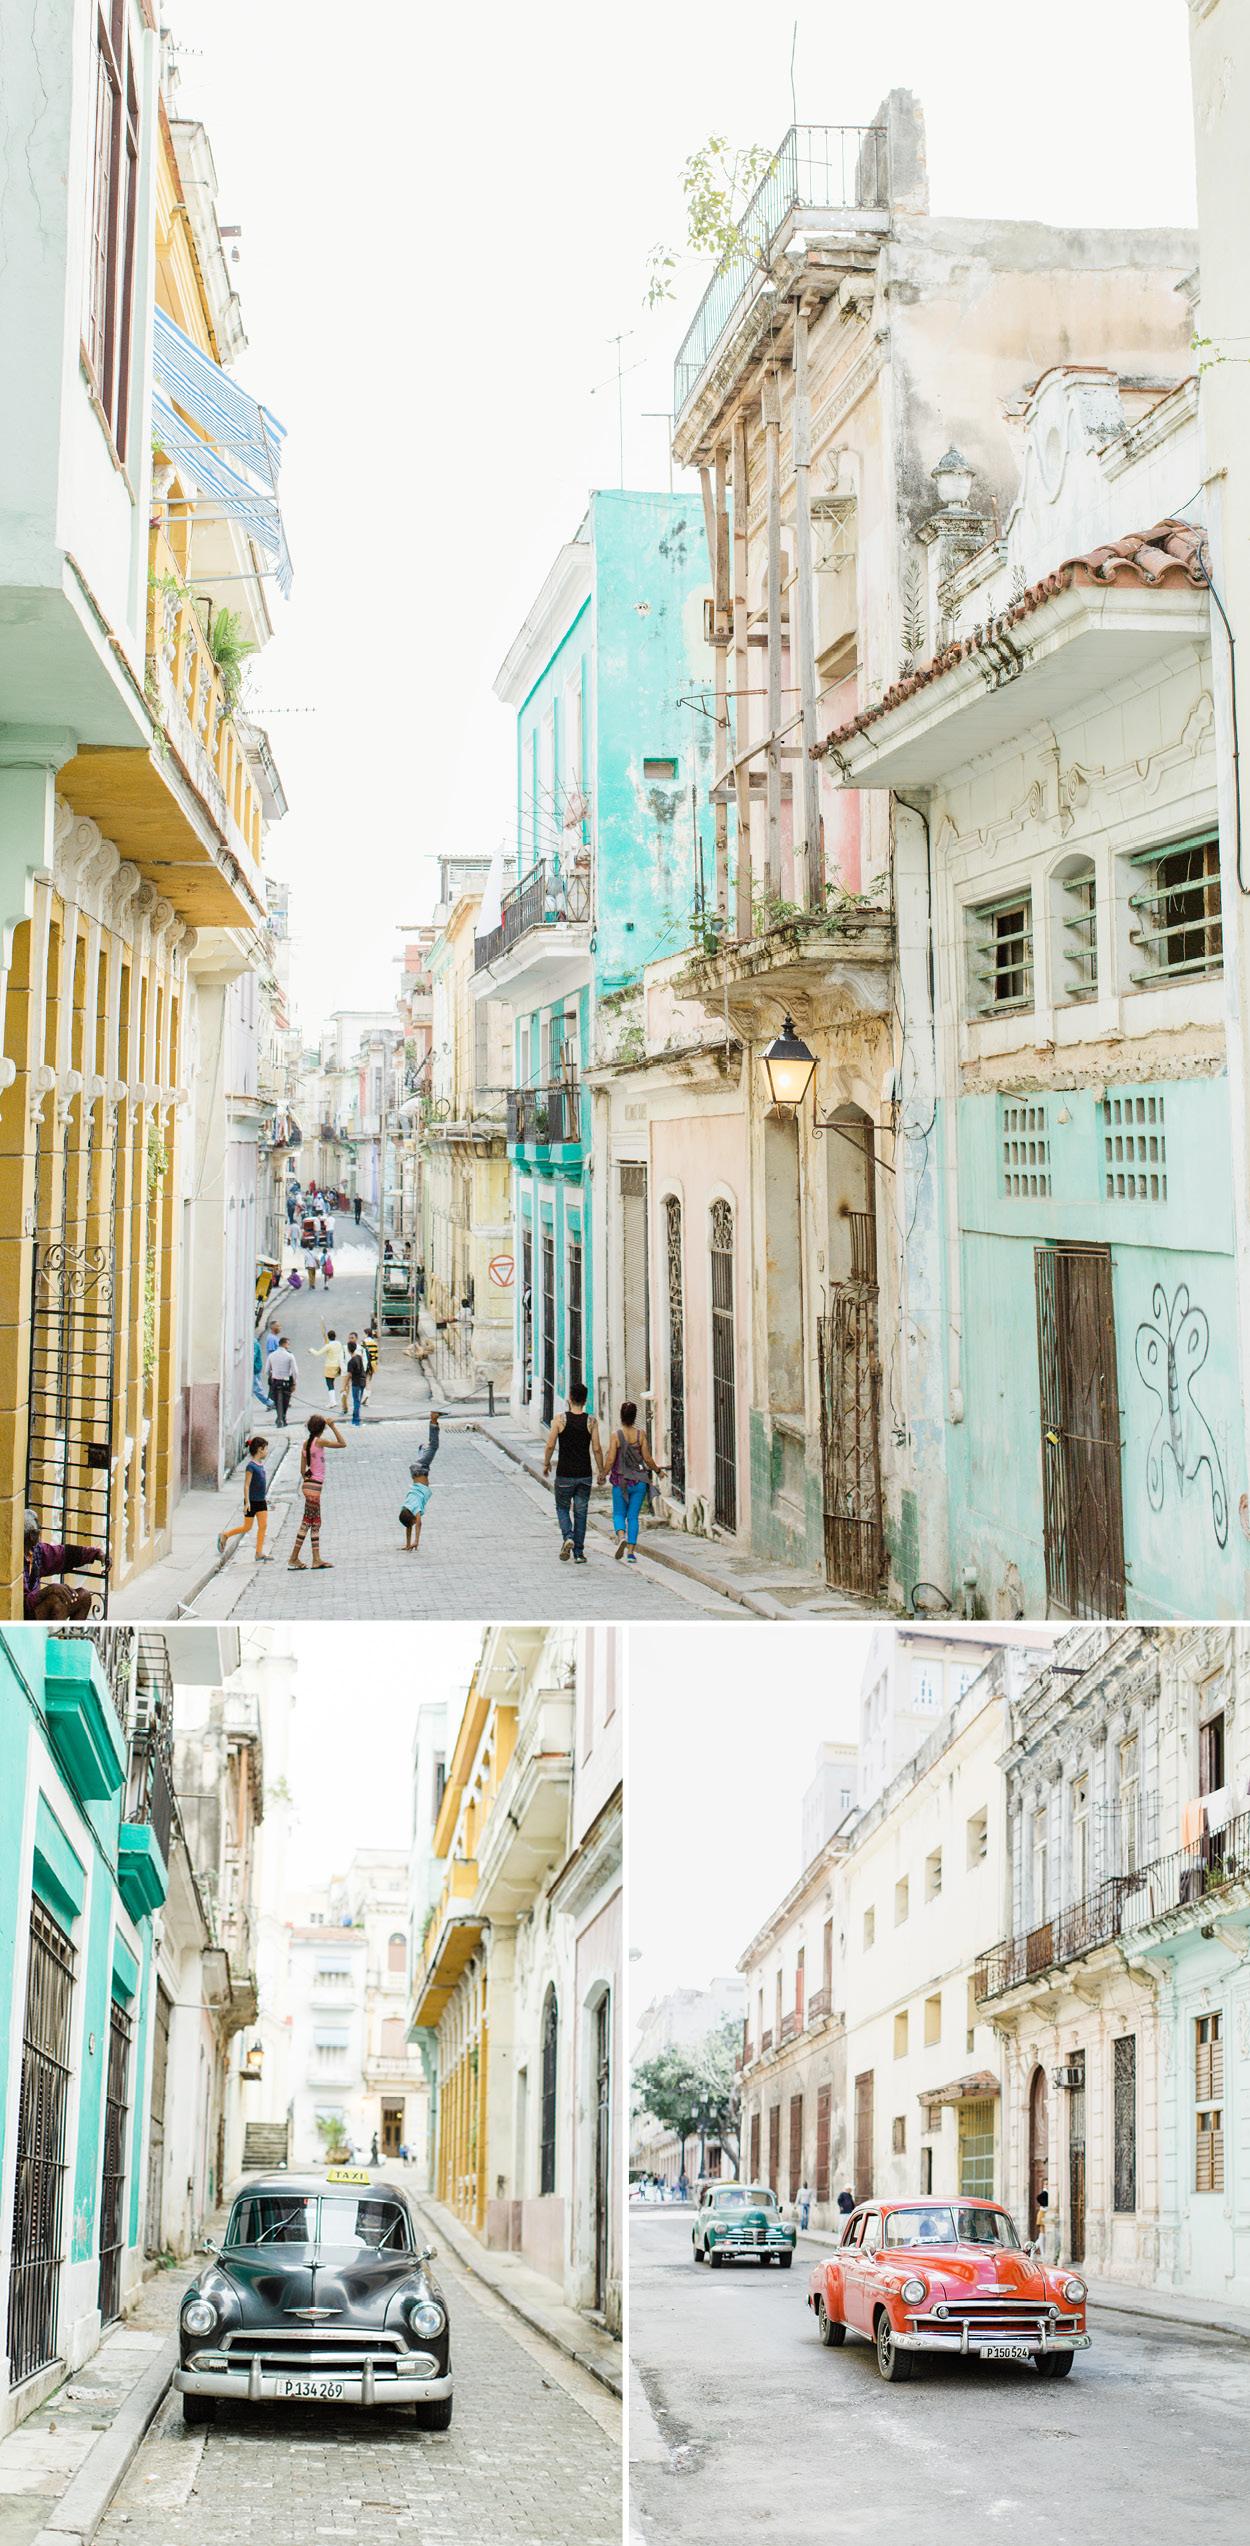 MatthewRee_Cuba_1_004.jpg